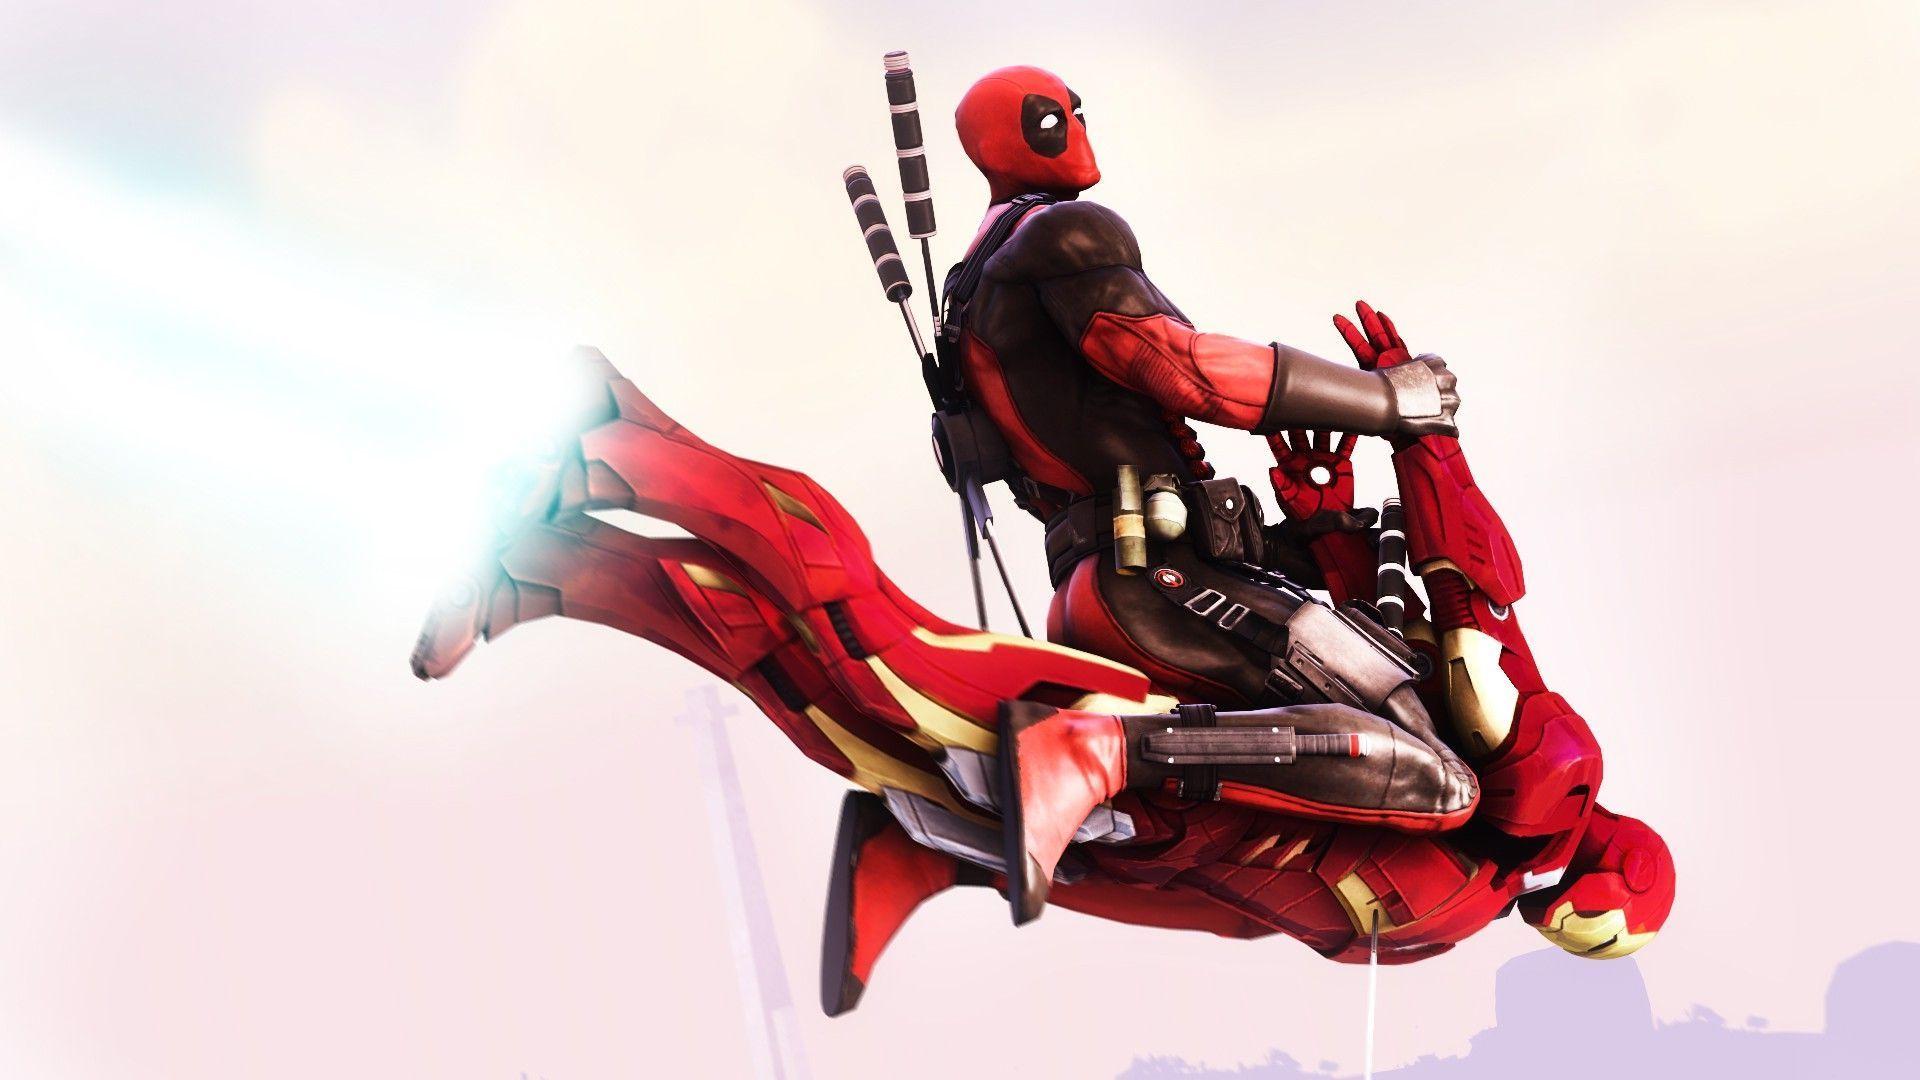 deadpool-flying-on-iron-man-funny-hd-1920x1080-cf-1920%C3%971080-wallpaper-wp3604710